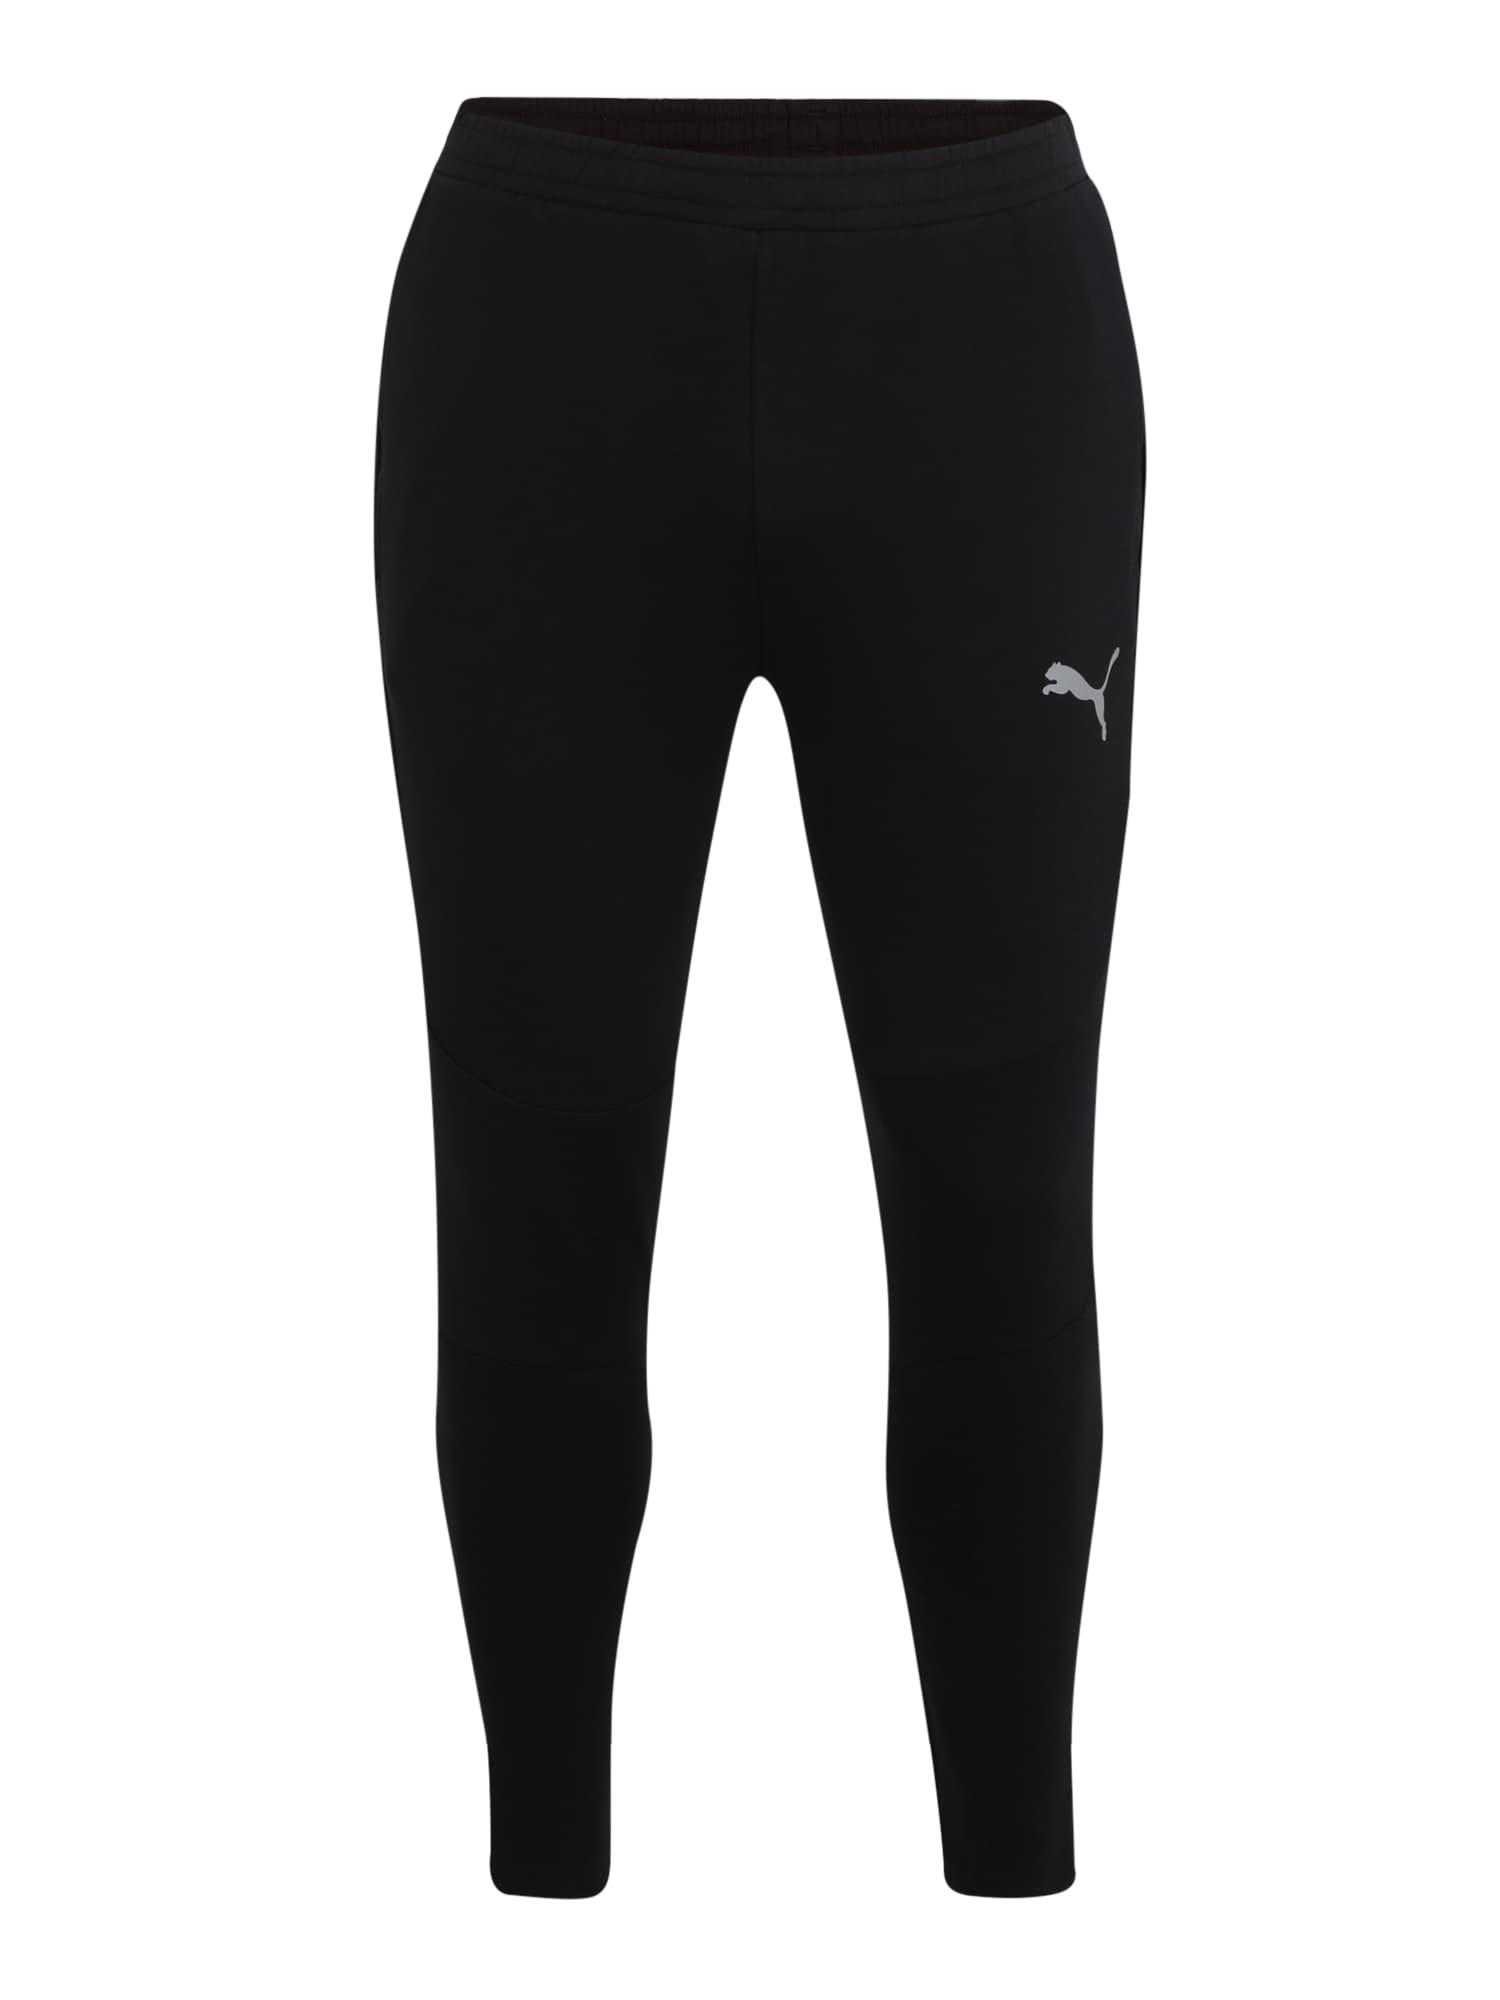 Sporthose 'Evostripe' | Sportbekleidung > Sporthosen > Sonstige Sporthosen | Puma